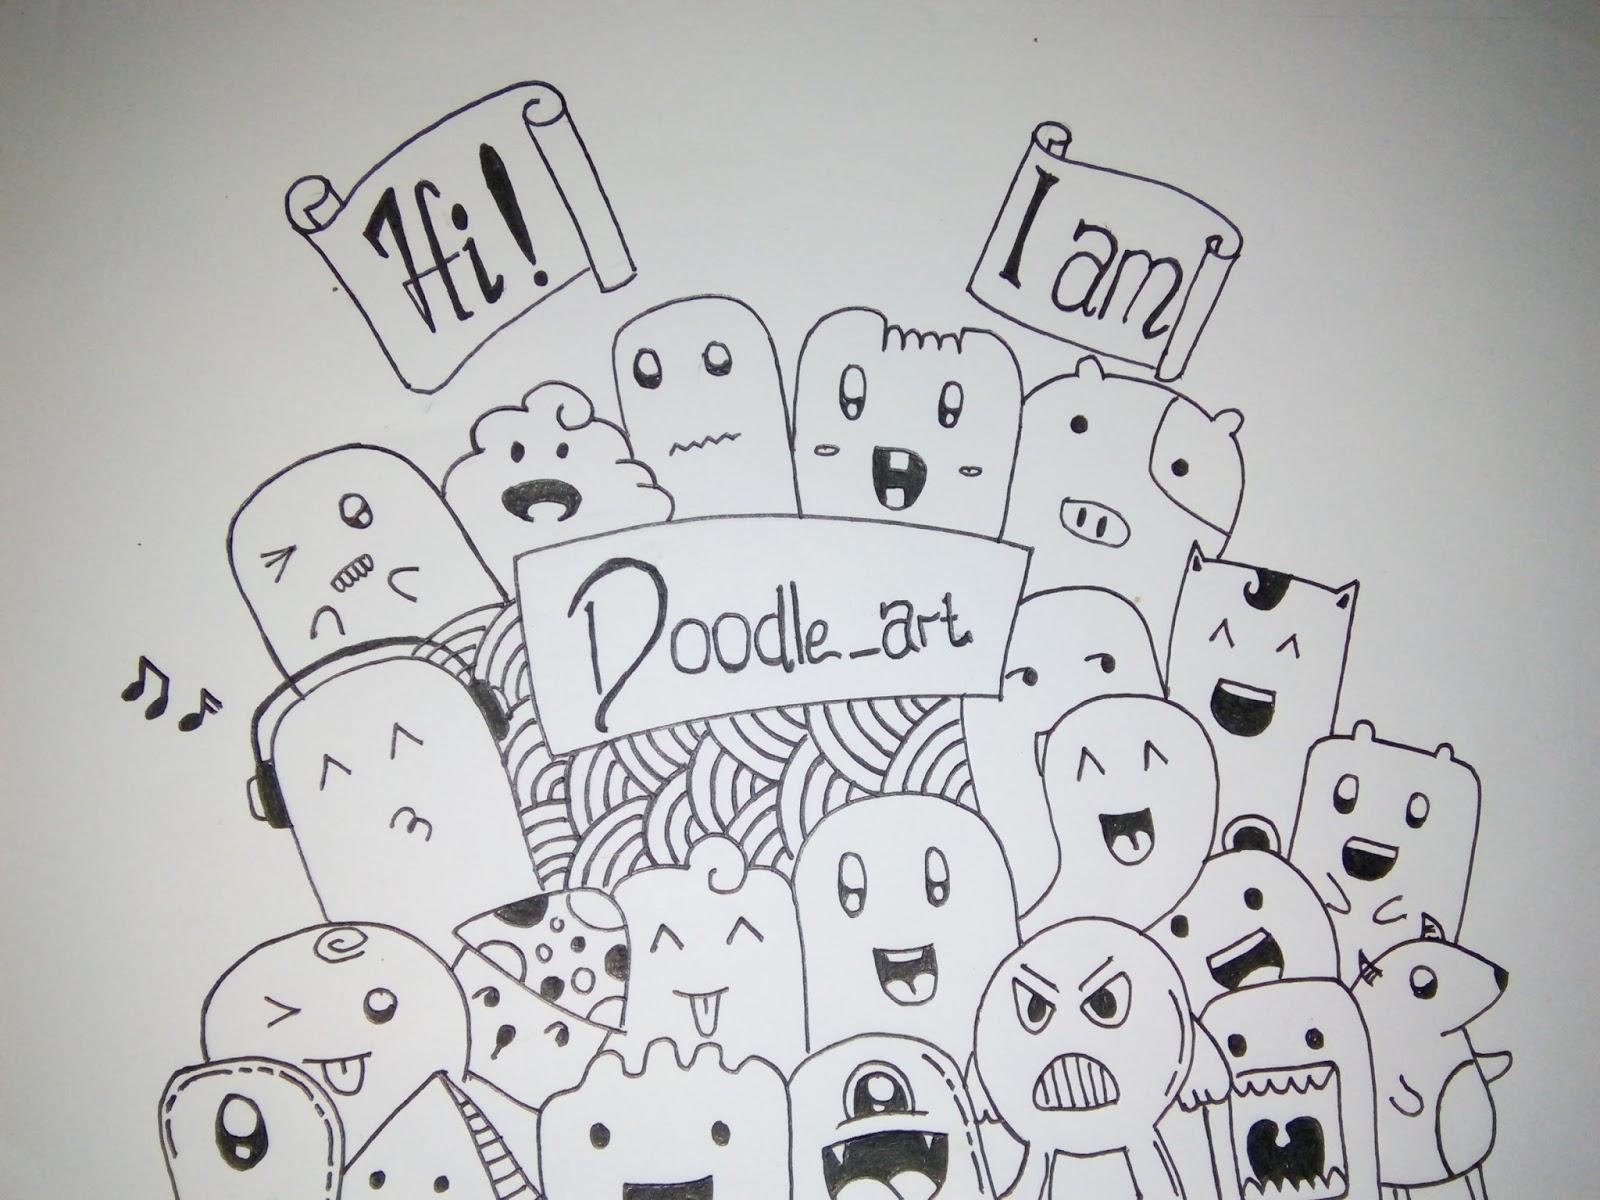 Contoh Gambar Doodle Art Sederhana Kantor Meme